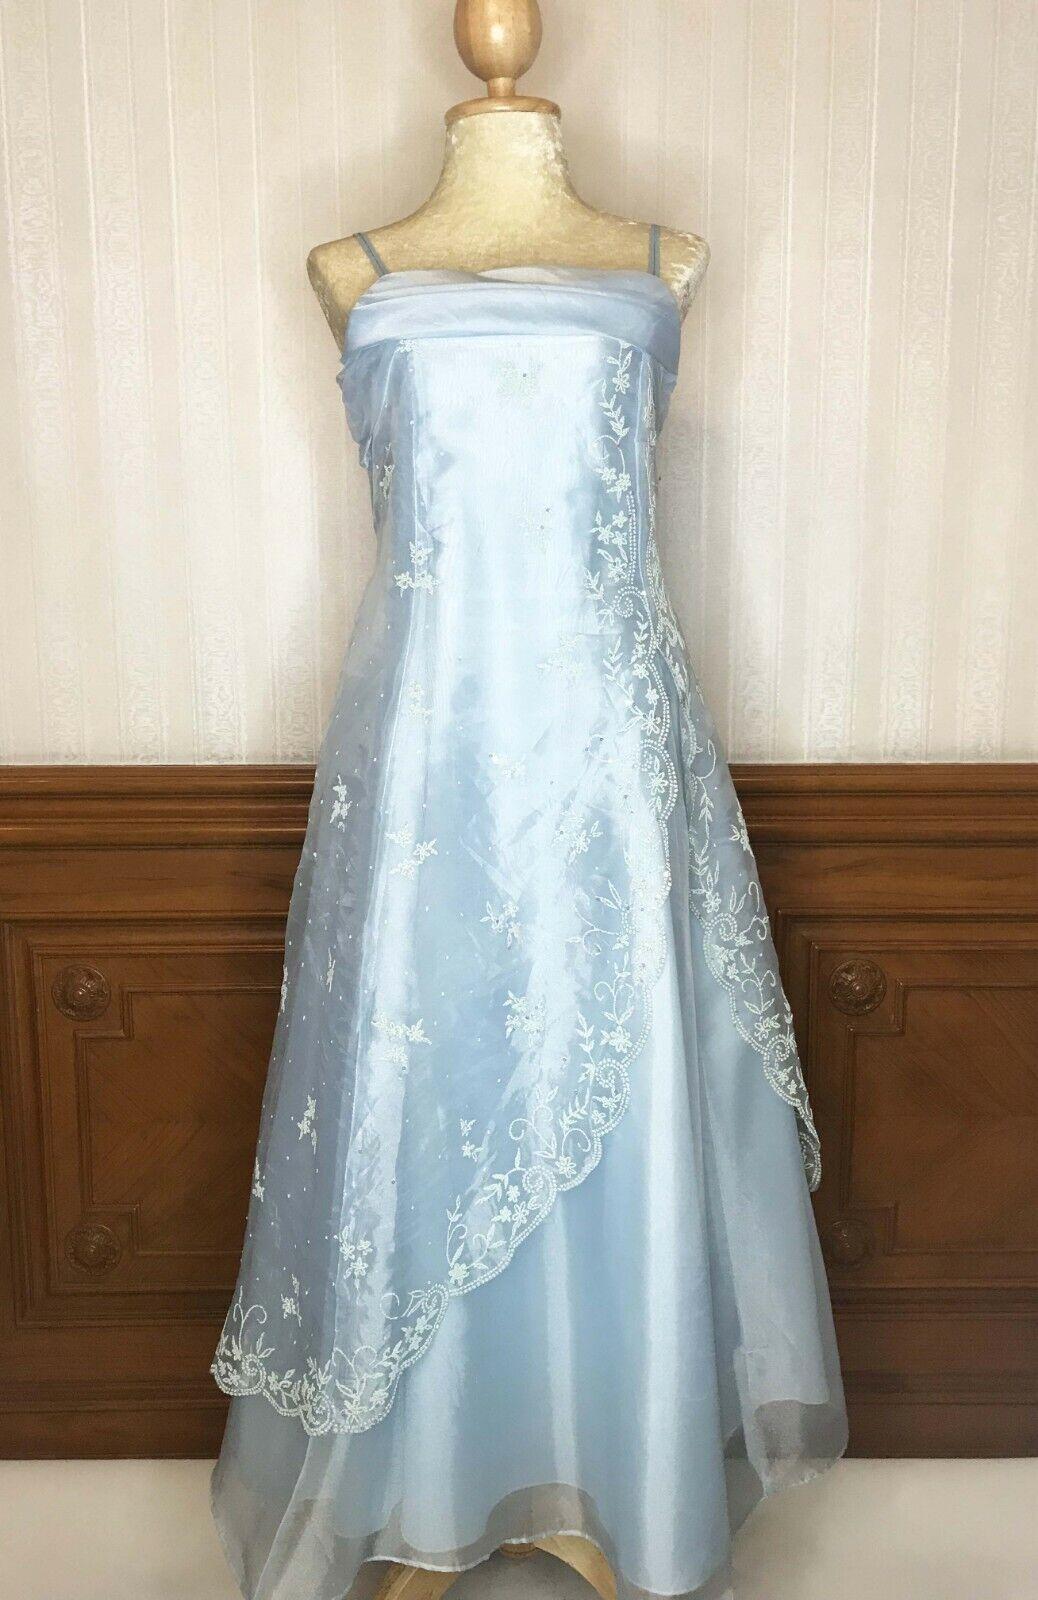 Vintage Spaghetti Strap Long Sheer Prom Party Formal Dress Blue 15/16 Sz USA